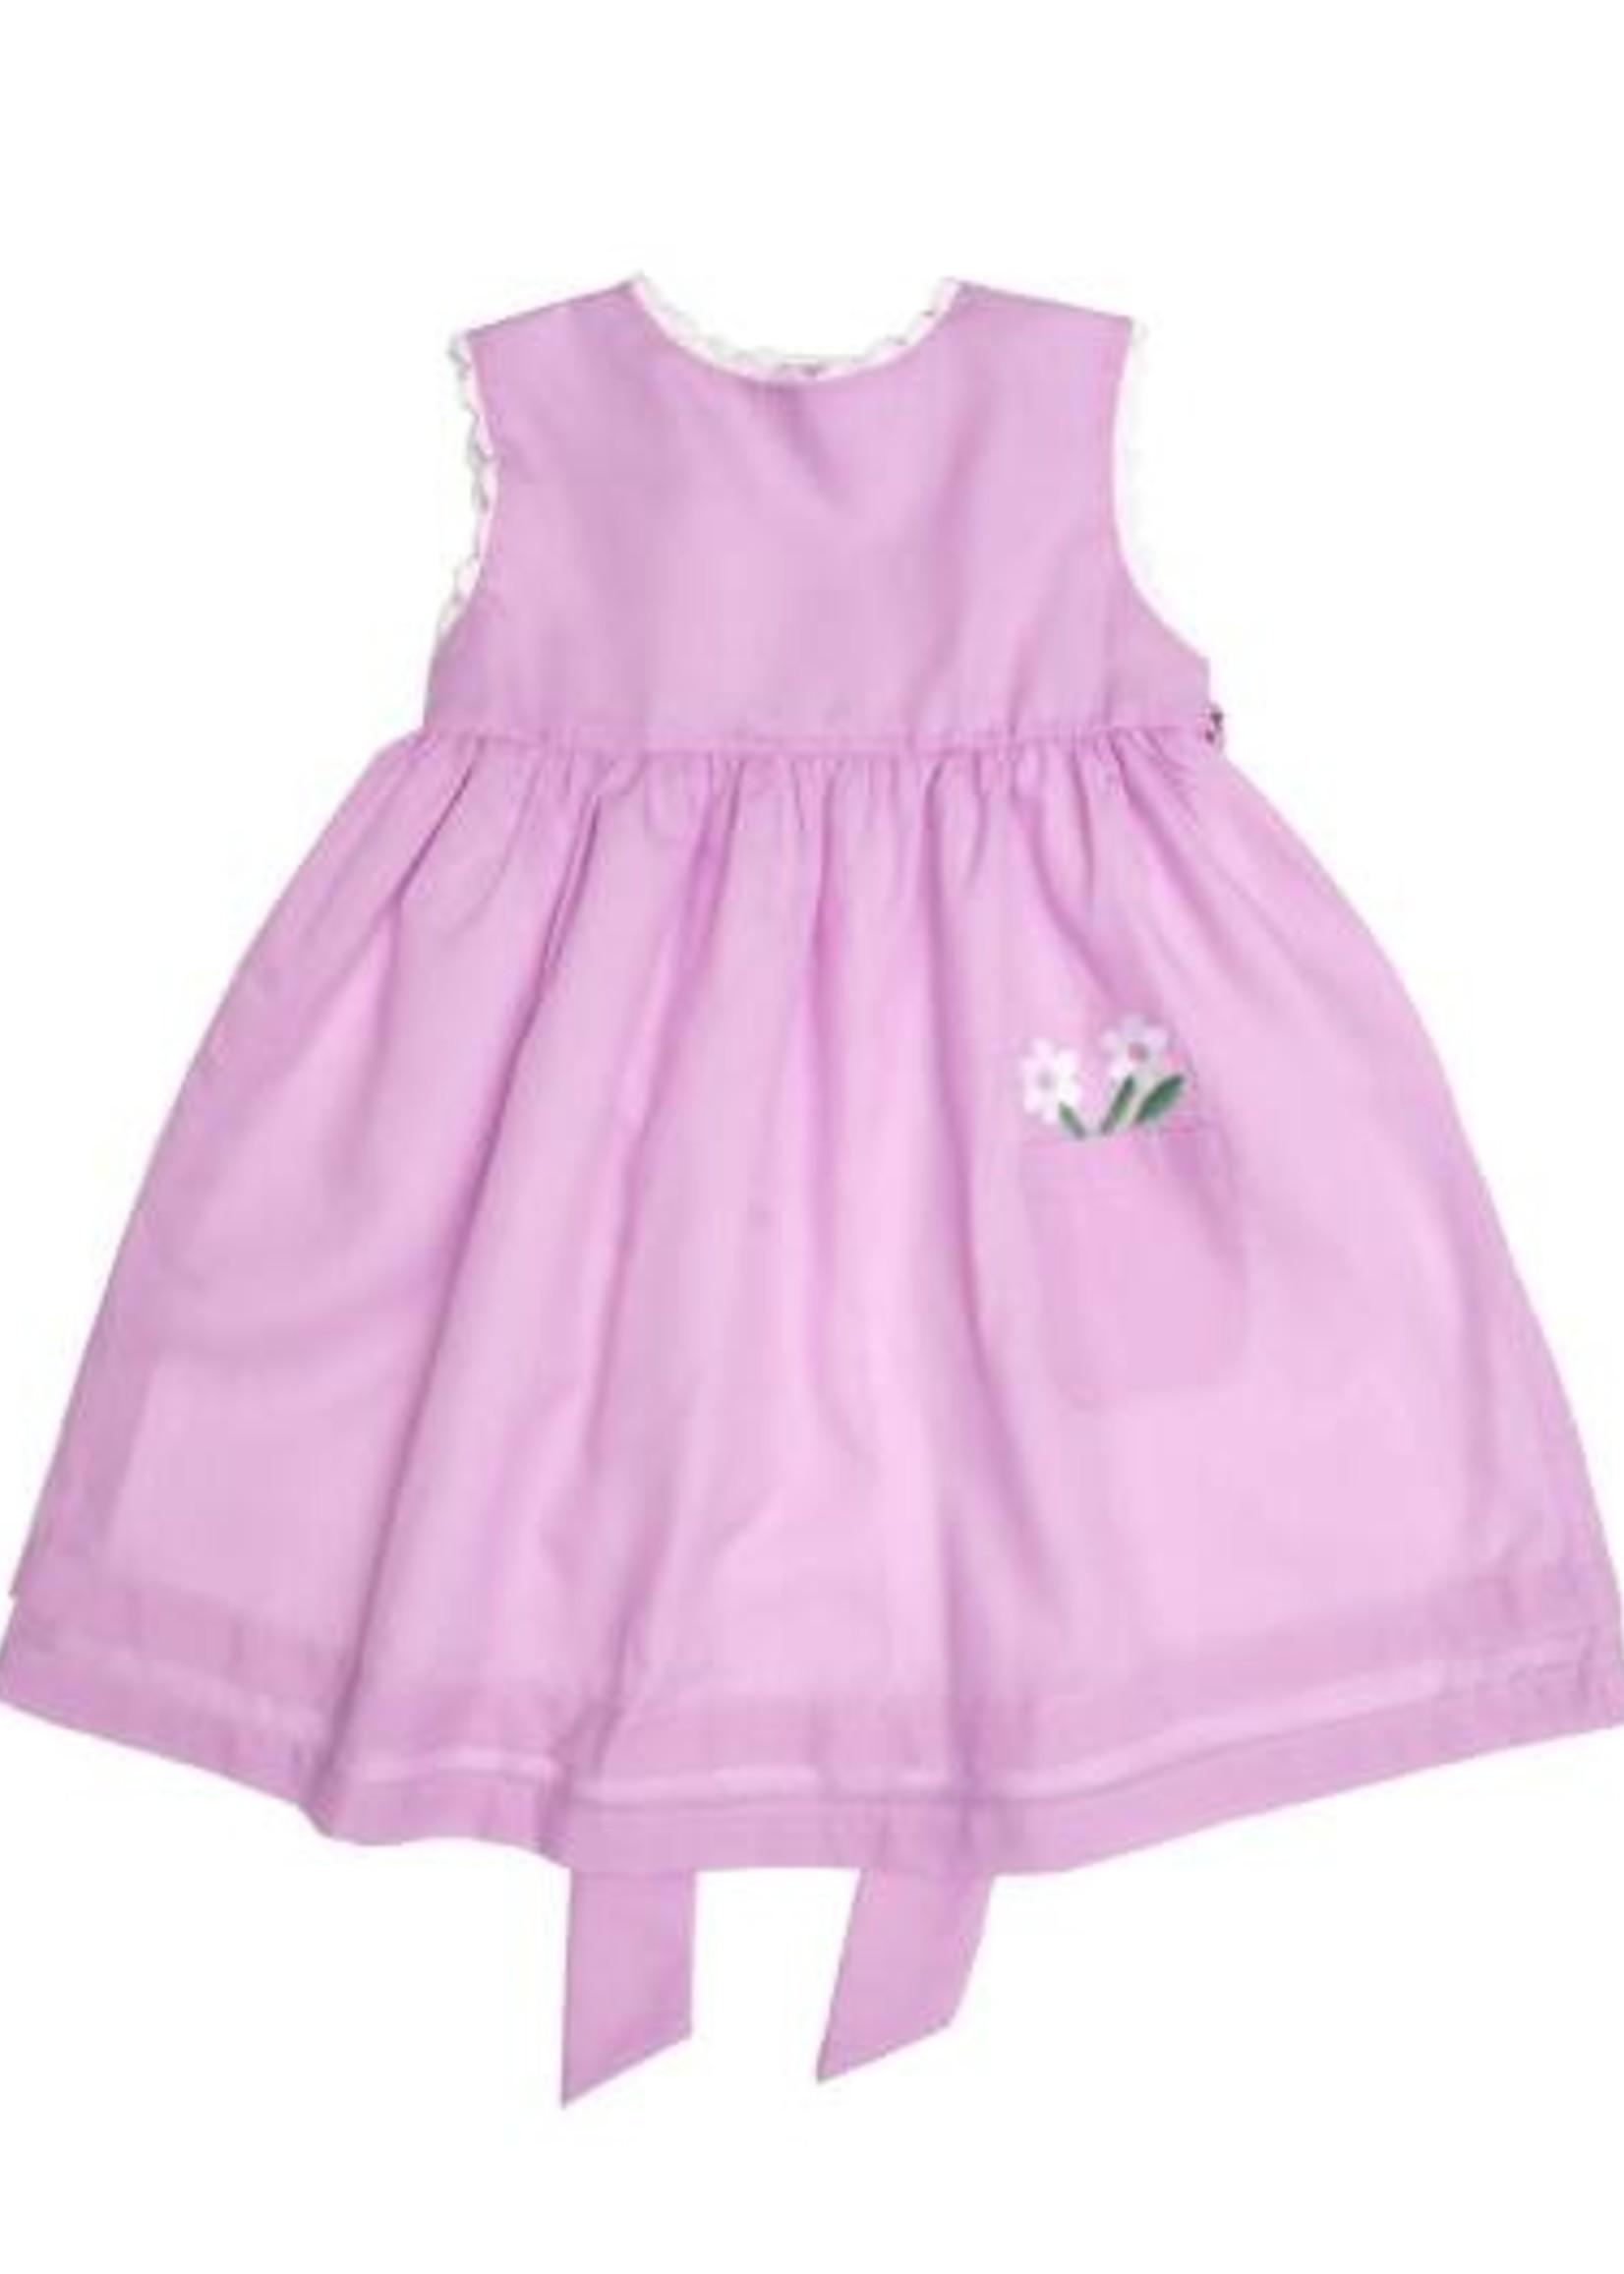 KENDALL PURPLE DRESS